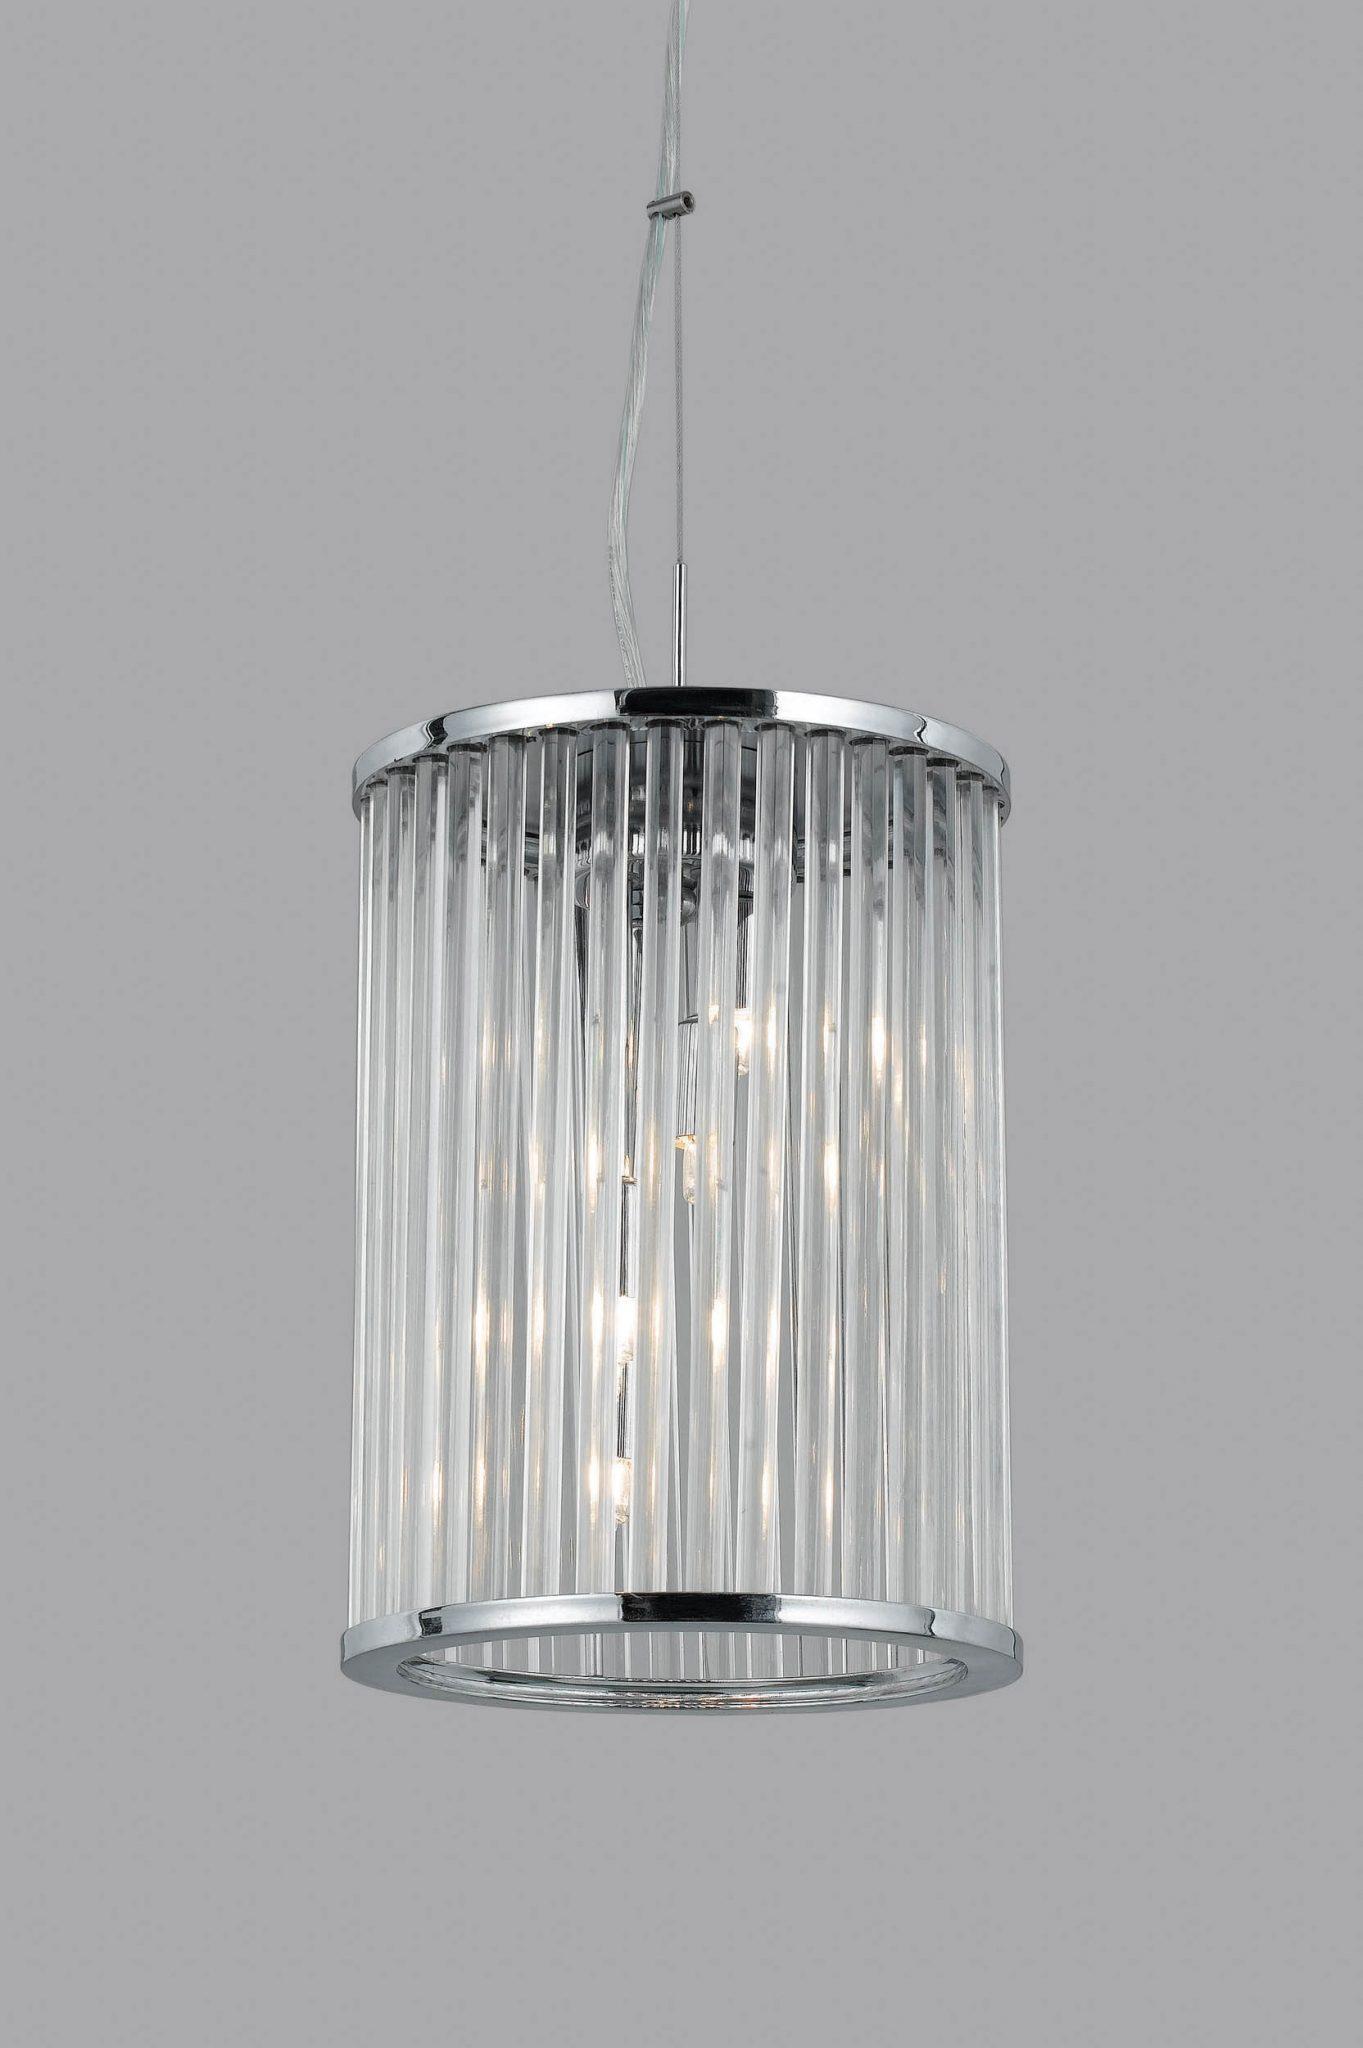 Impex LG012171/04/CH Oklahoma 4 light Lantern, Chrome